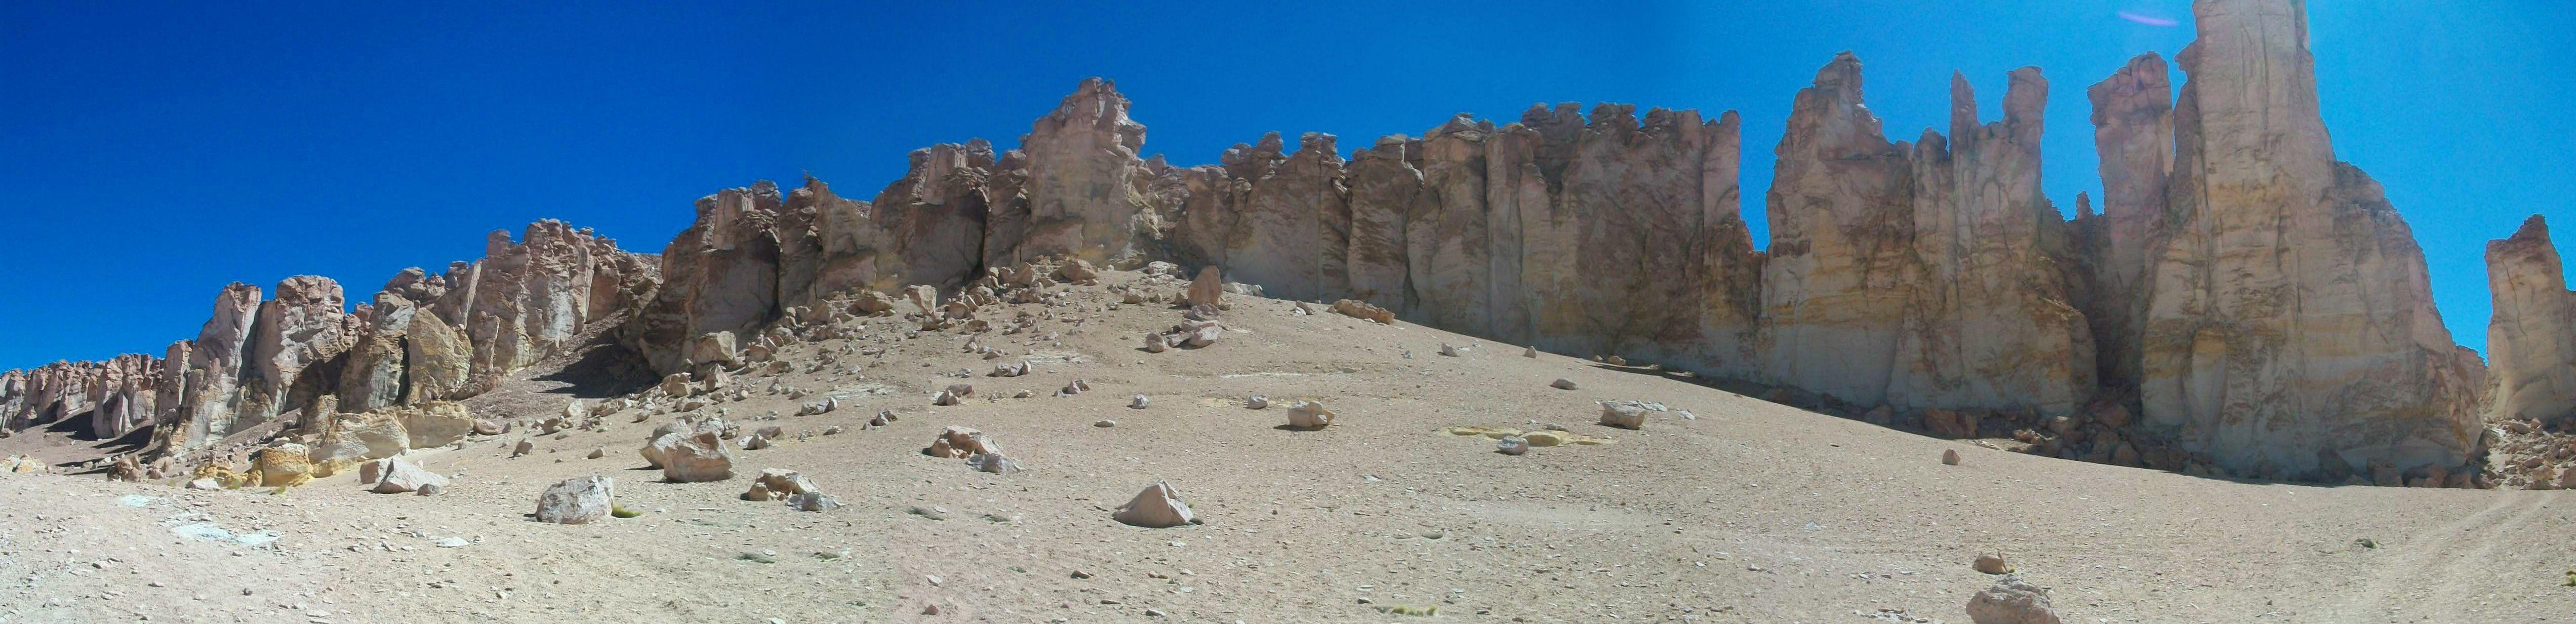 Catedrales de cenizas. San Pedro de Atacama